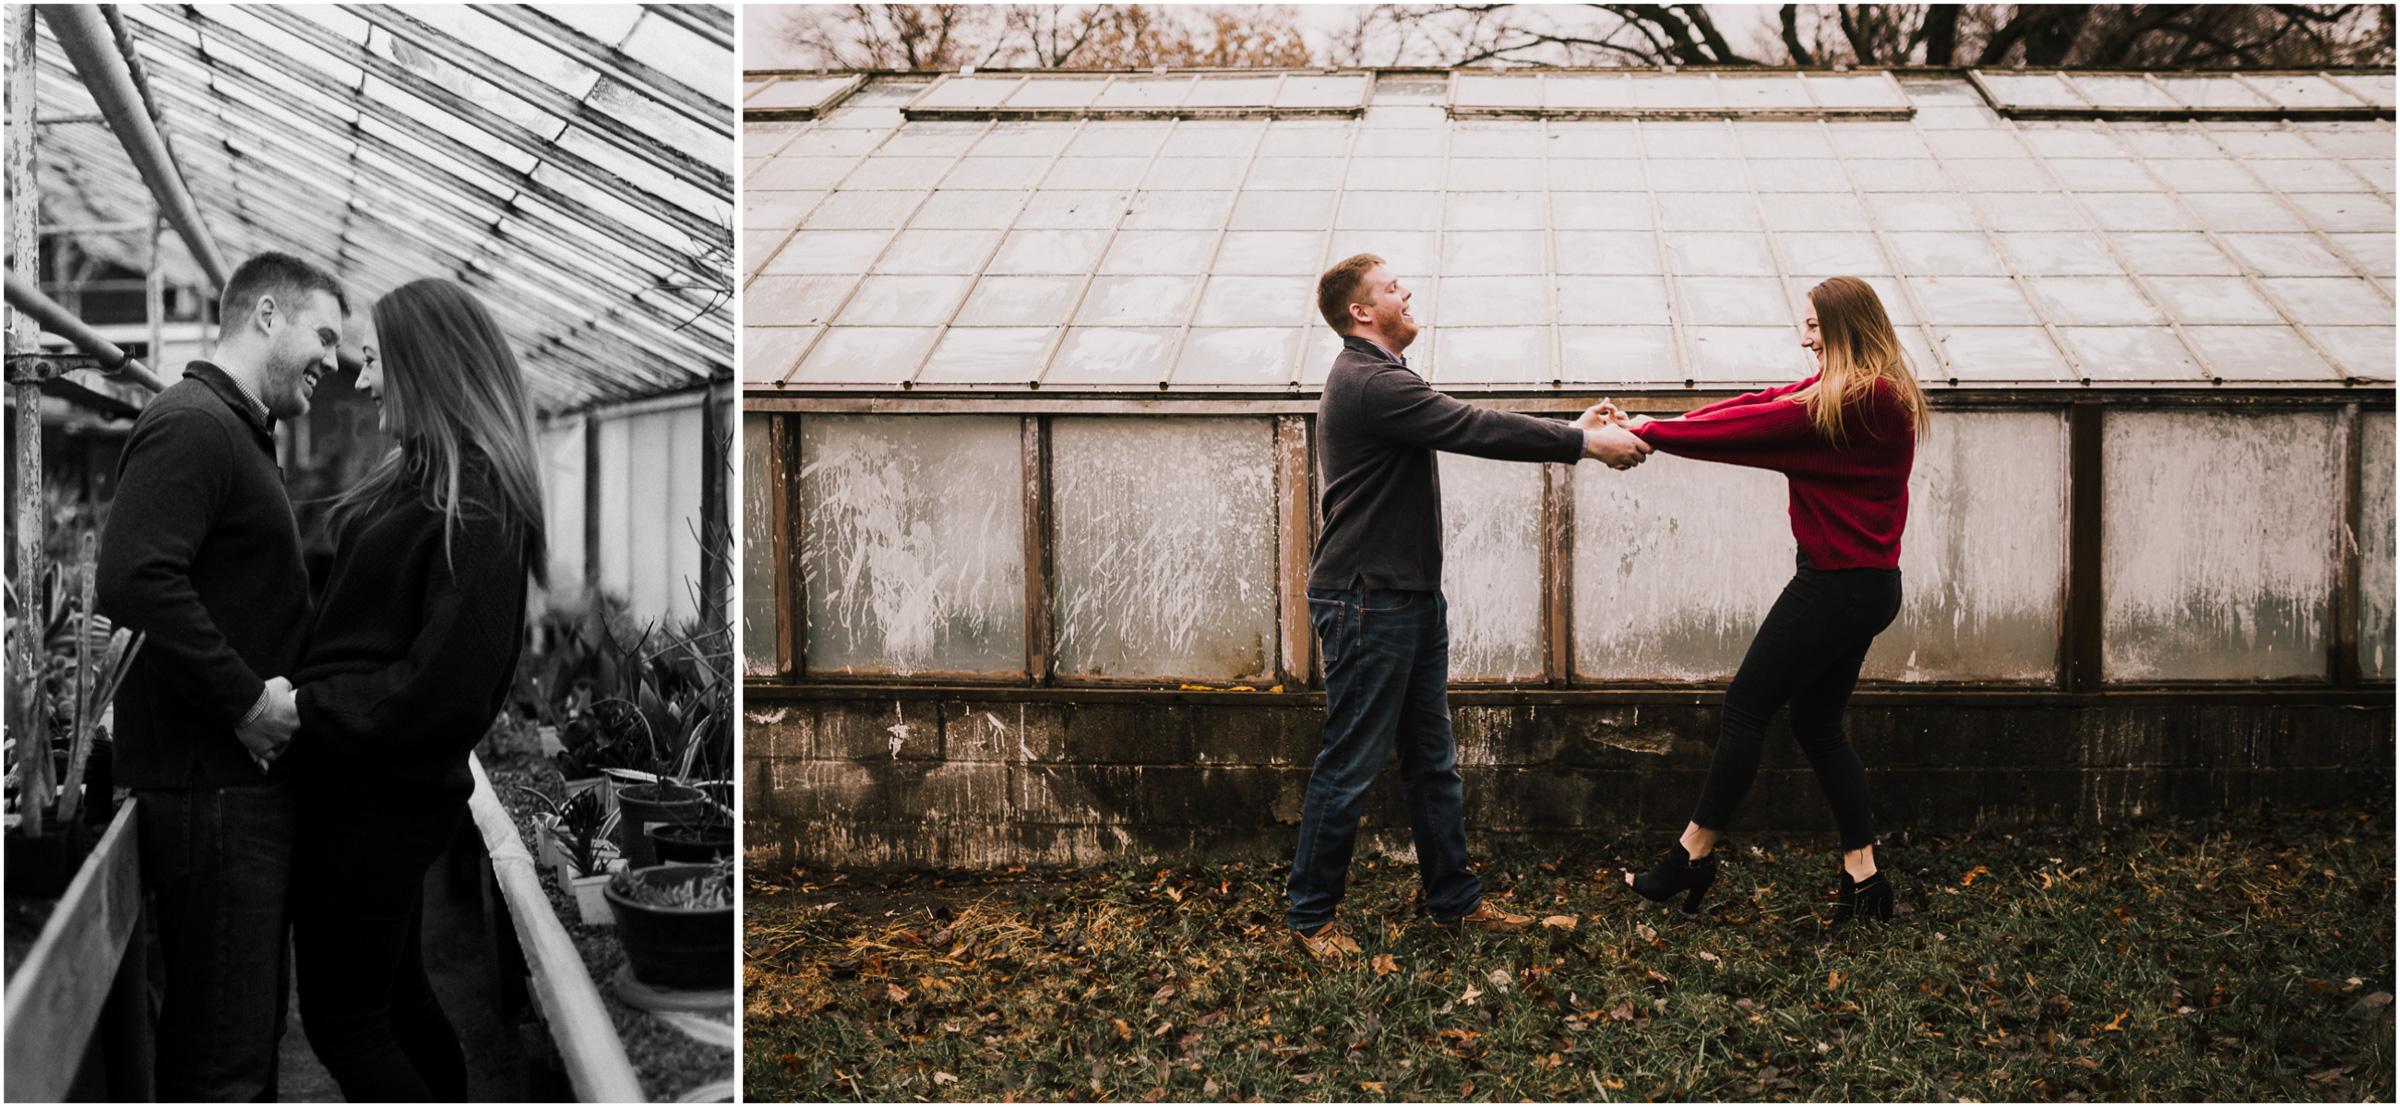 alyssa barletter photography johns greenhouse kansas city missouri brookside waldo engagement session winter-12.jpg